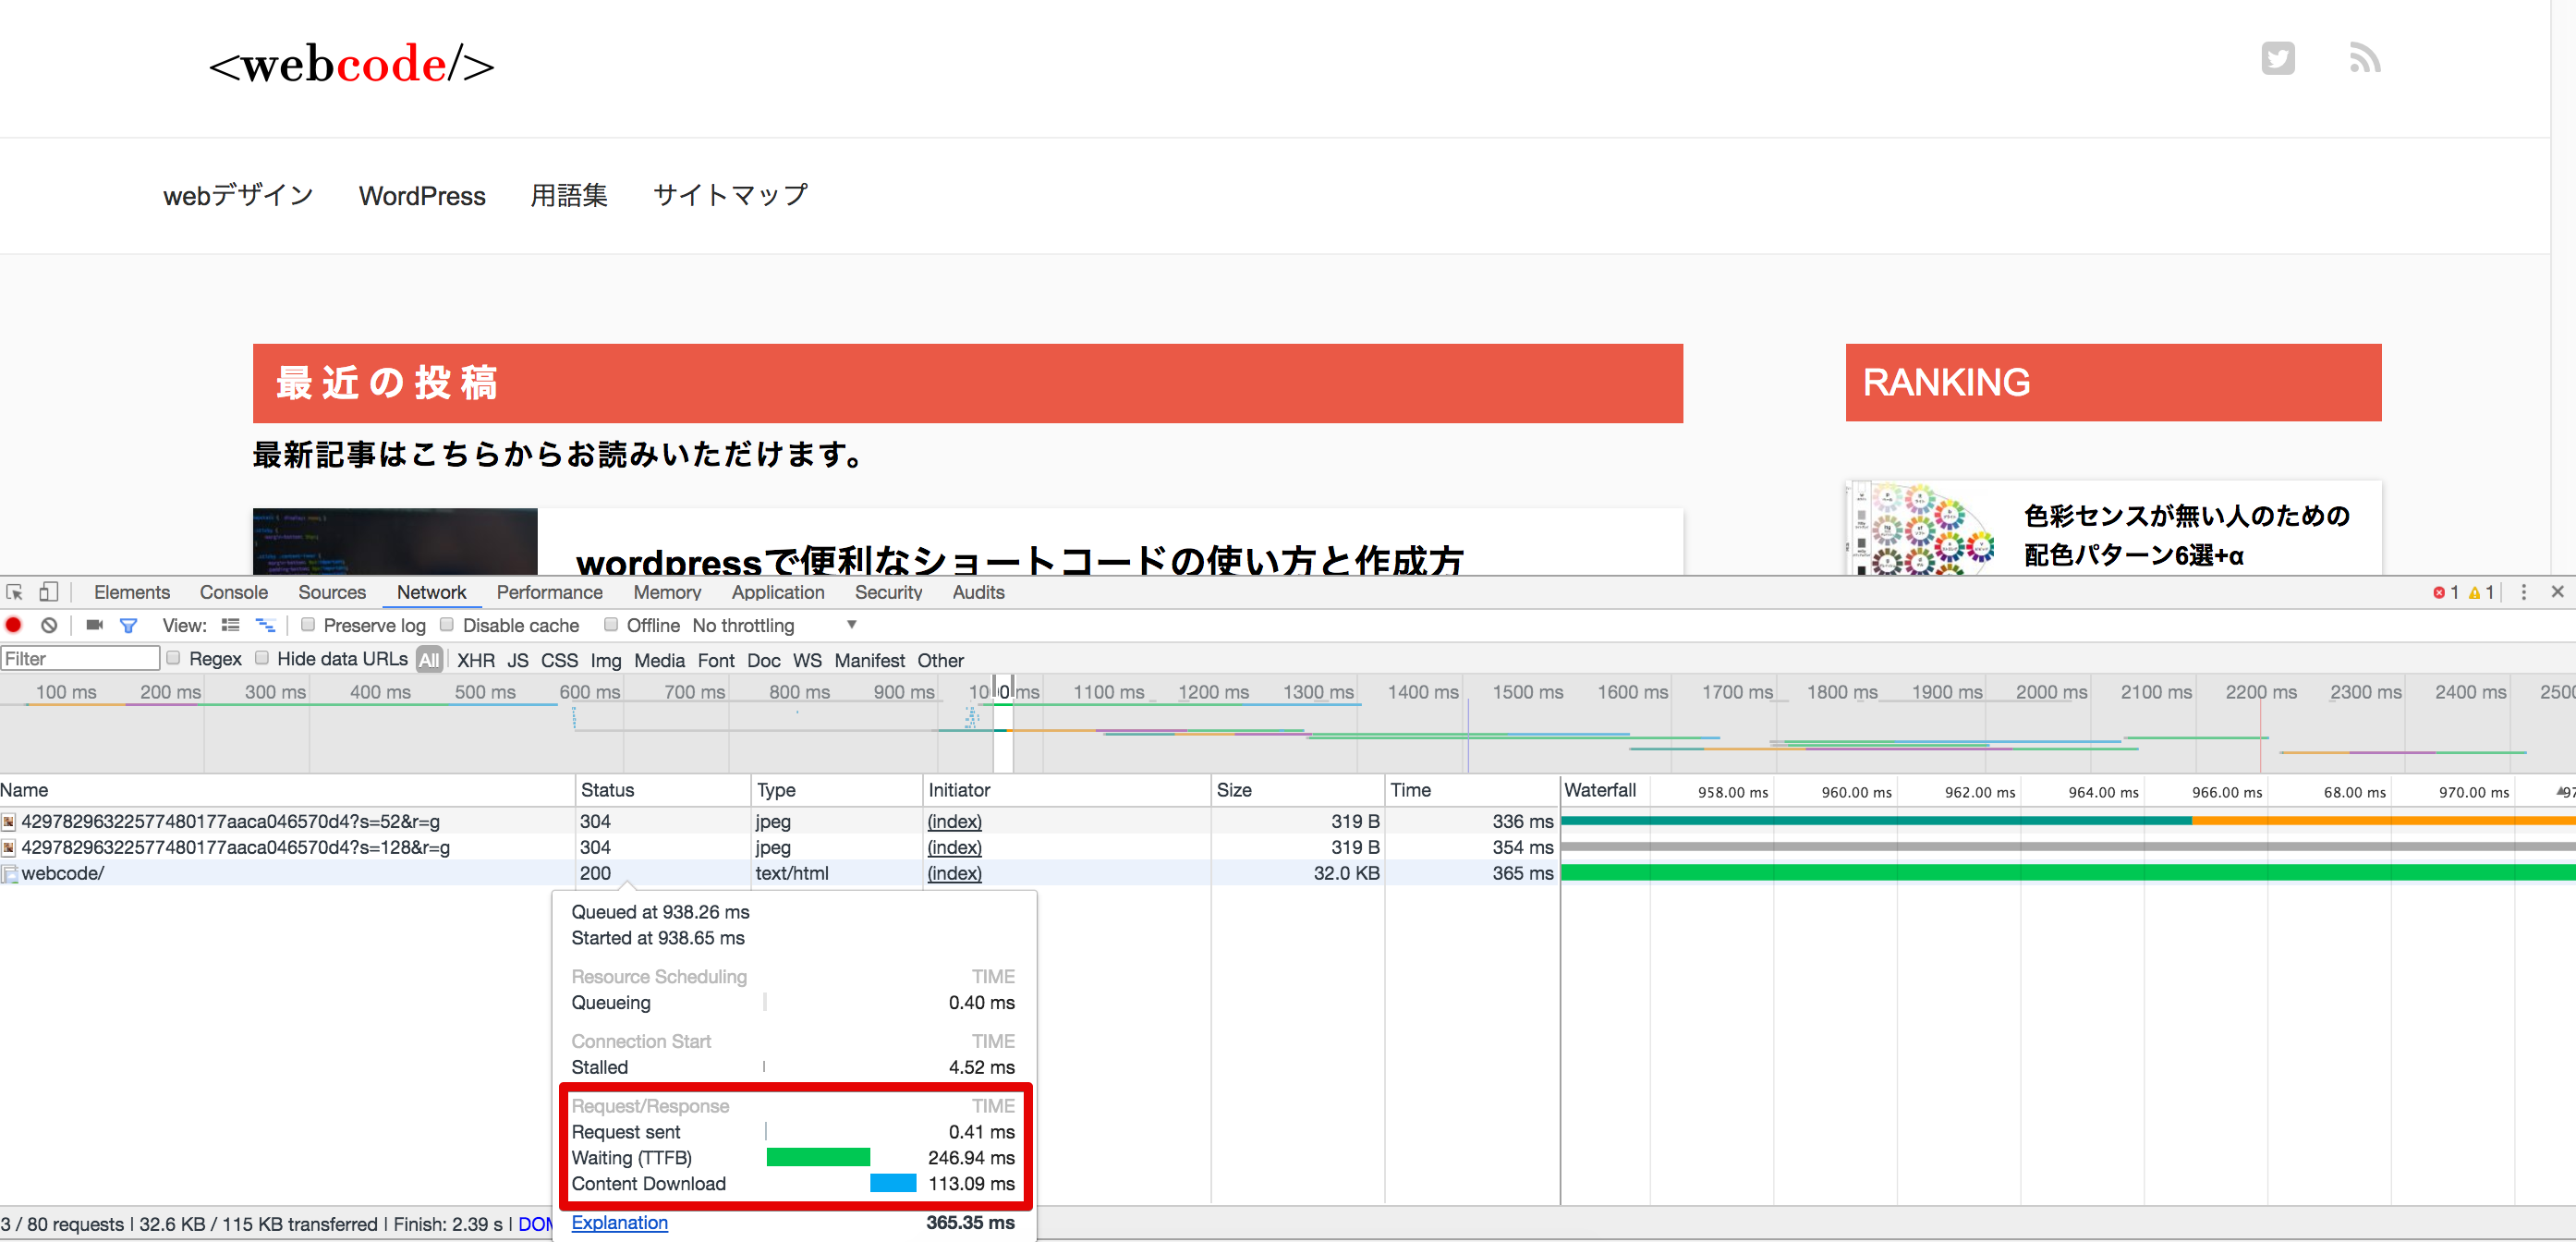 37f7311819b4d3919fbf6664309ac2a8 - wordpress高速化とプラグイン比較!ユーザービリティ向上の4ステップ